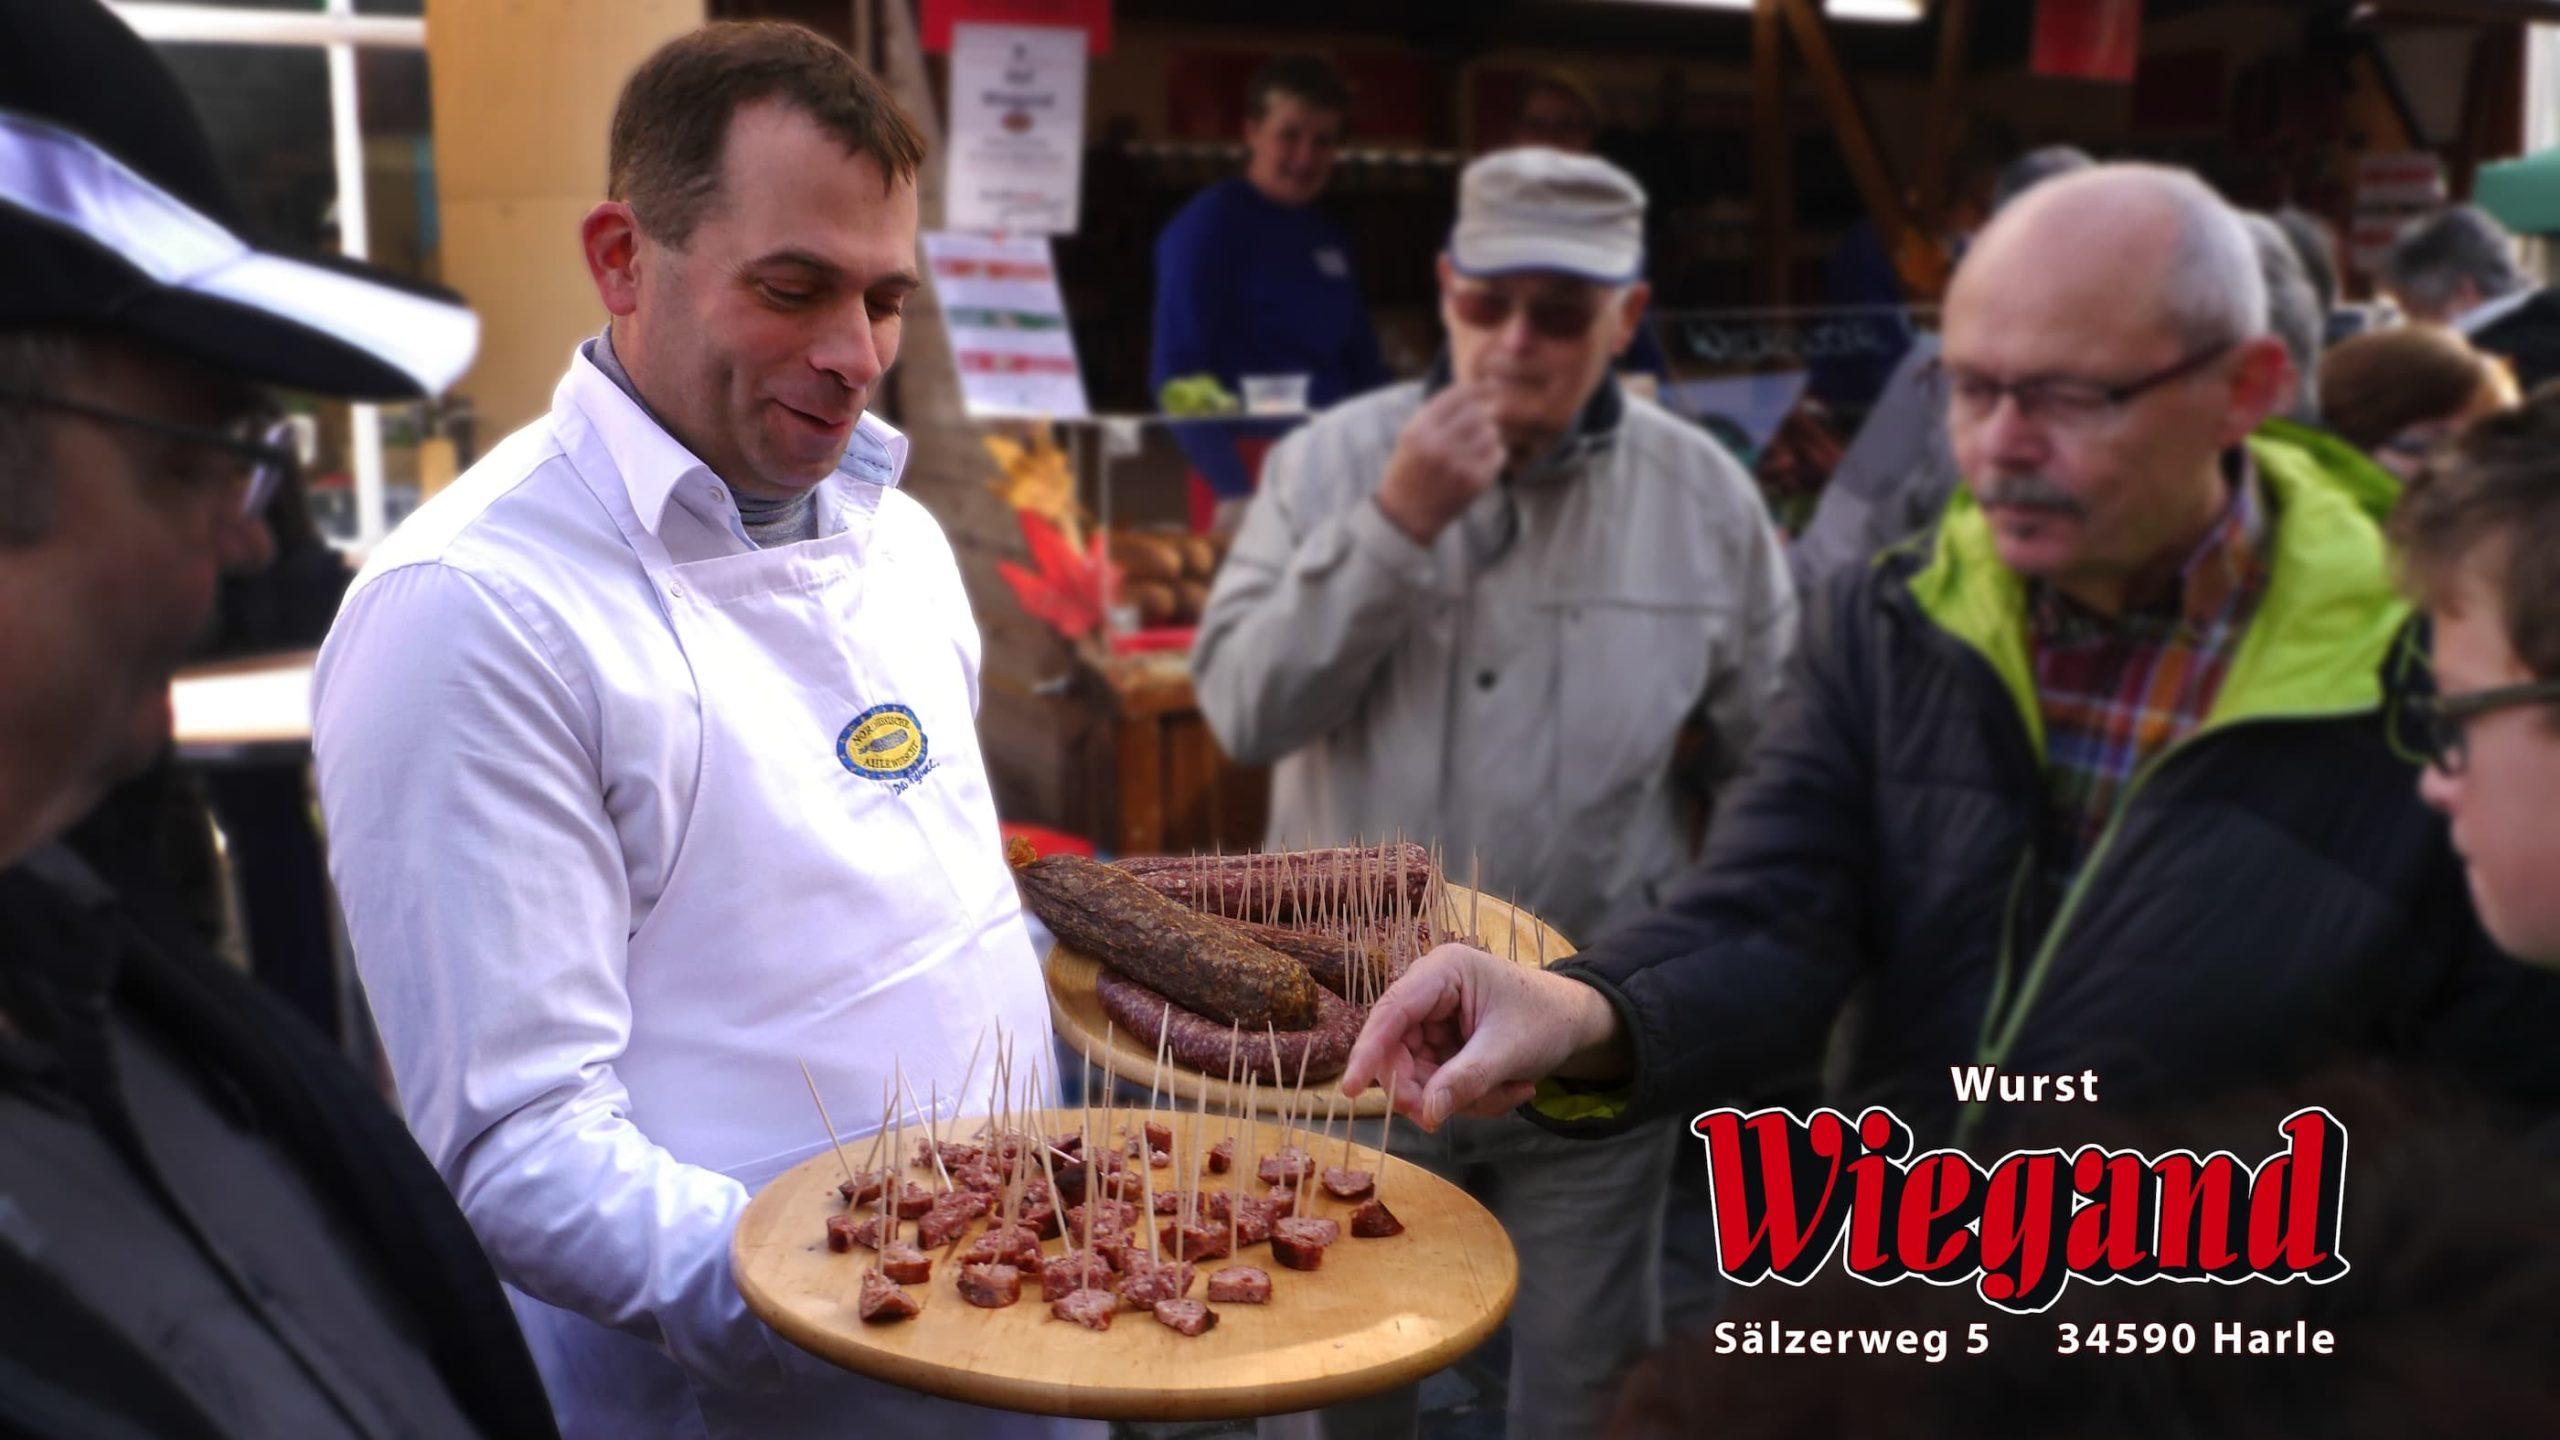 Wolfgang Wiegand Herstellung Ahle Wurscht